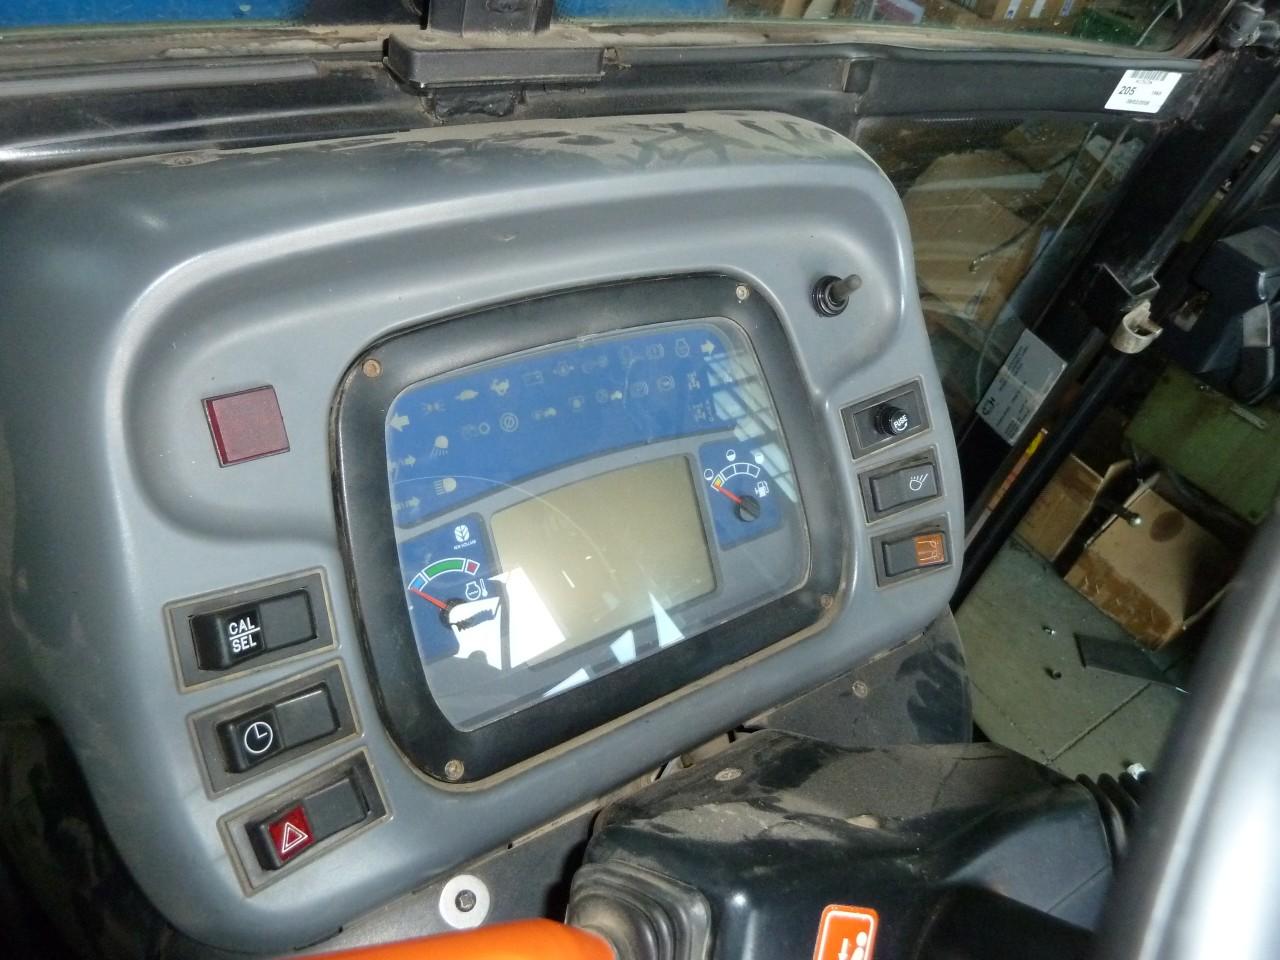 new-holland-tn-75-da-dt-cab-4.jpg